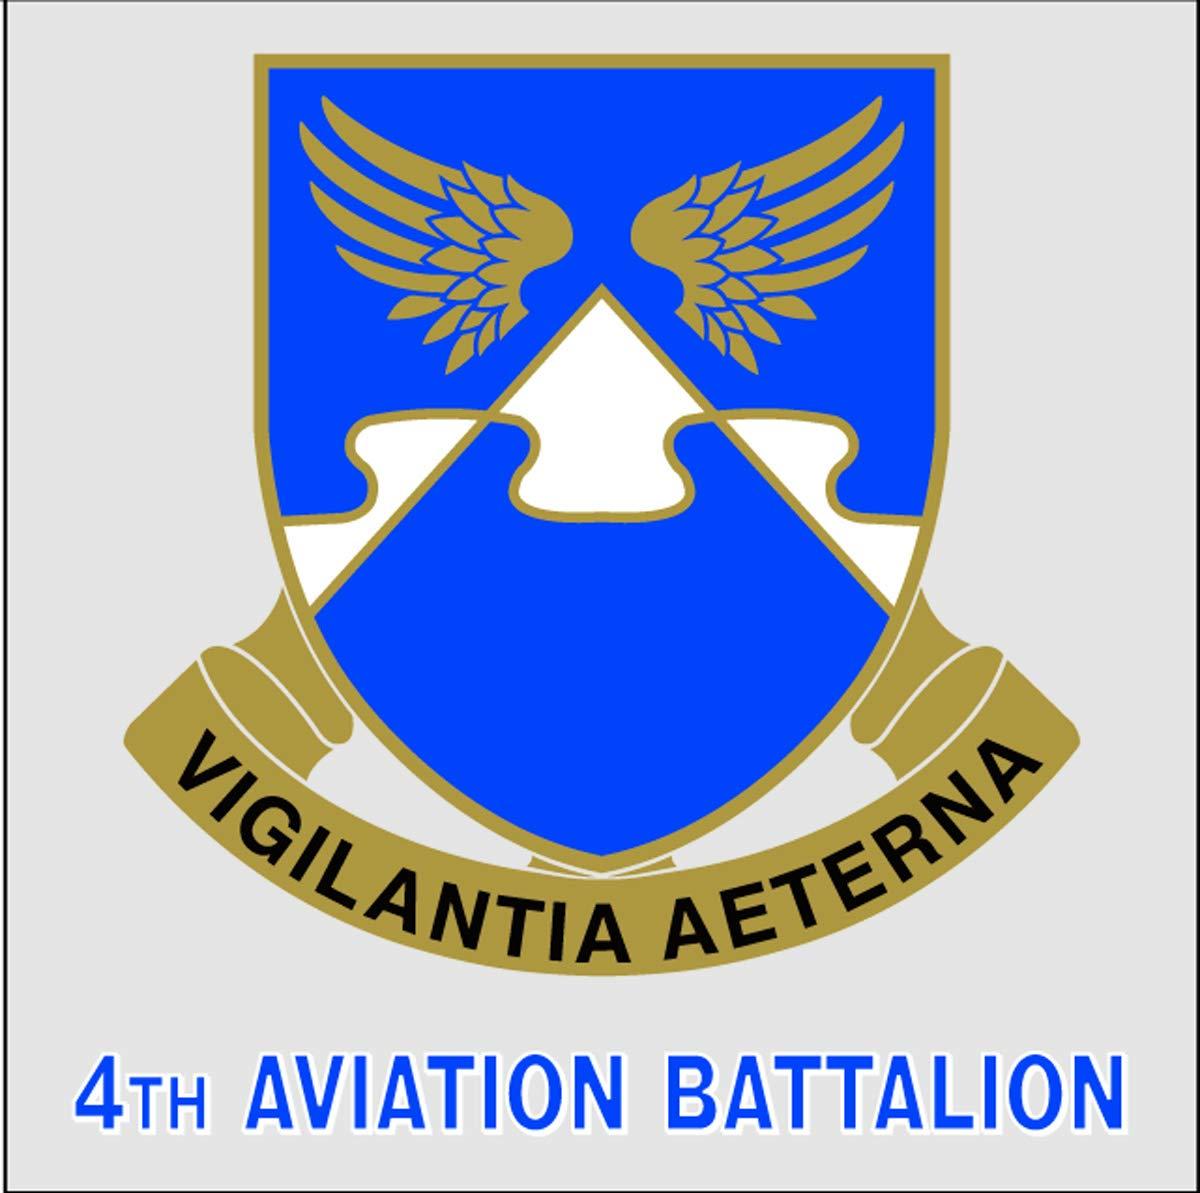 4th Aviation Battalion Unit Crest Decal